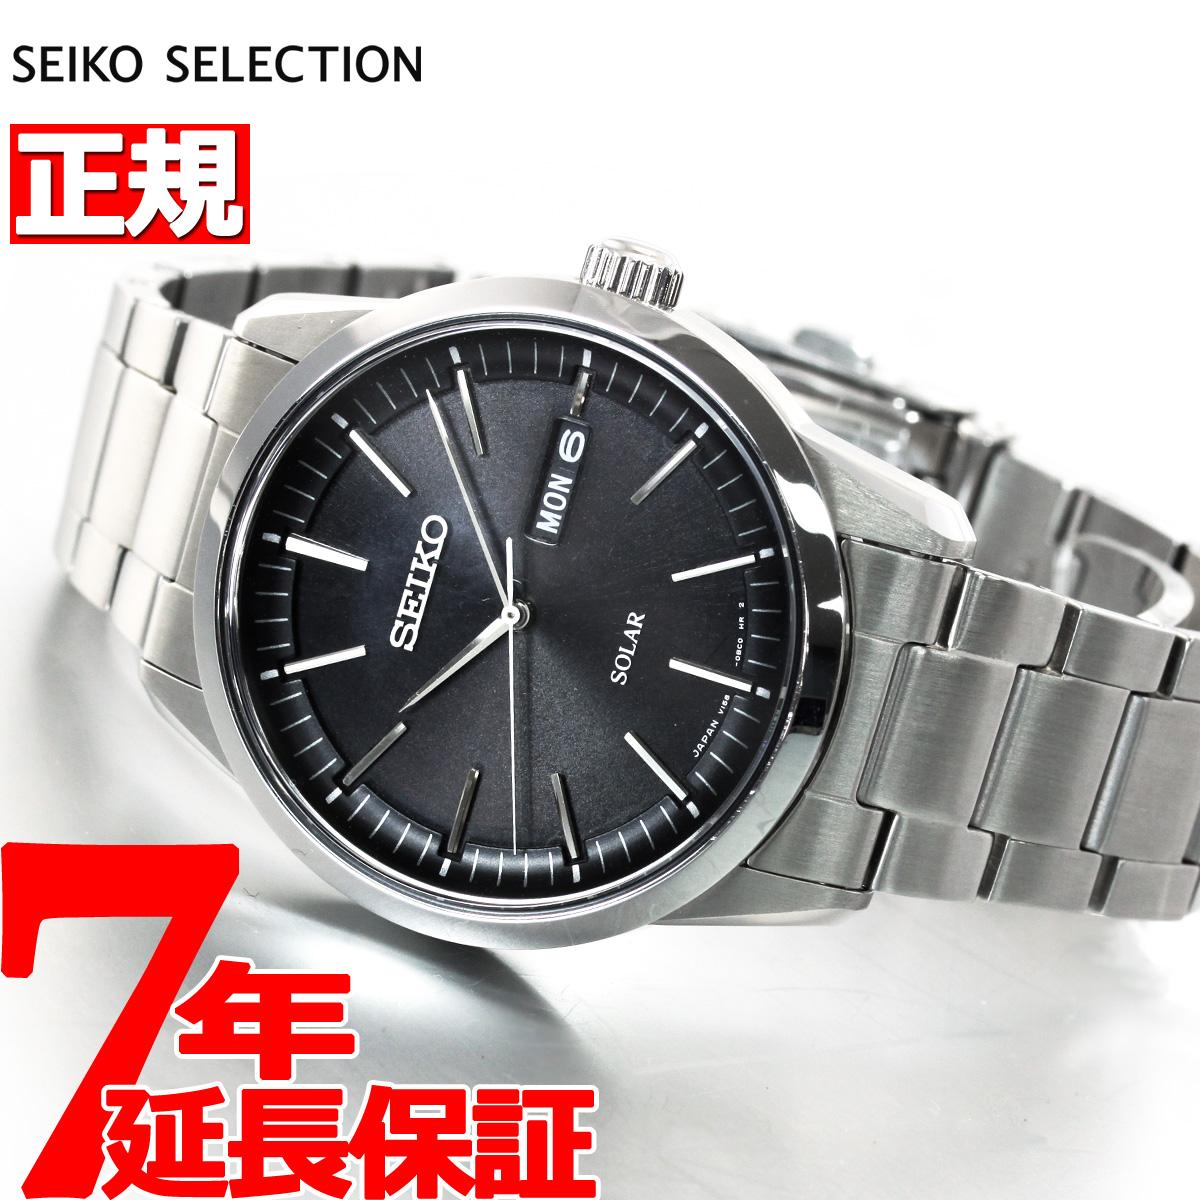 low priced f97ce c6bf3 SEIKO spirit slender SEIKO SPIRIT SMART solar watch men SBPX063